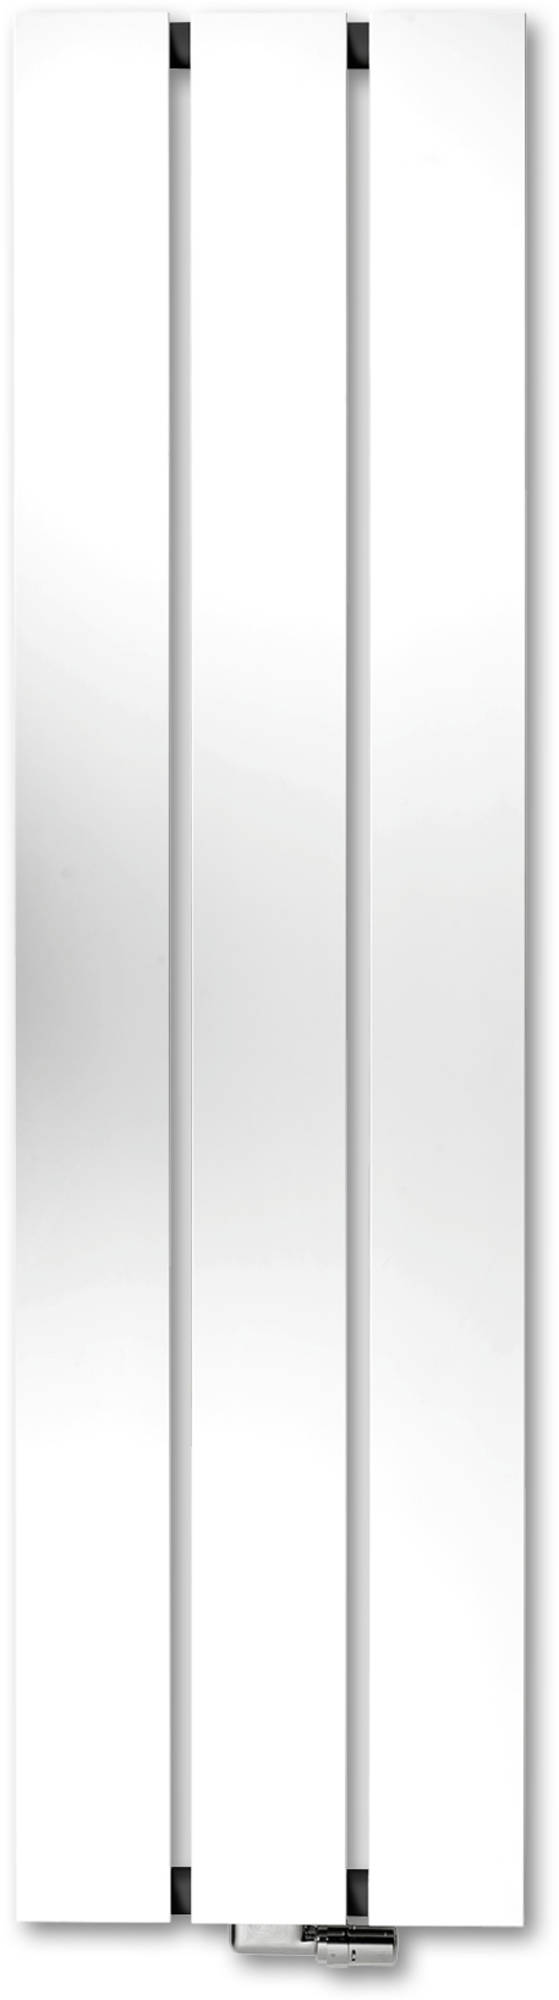 Vasco Beams Designradiator 49x200 cm As=0066 M304 Bruin Januari